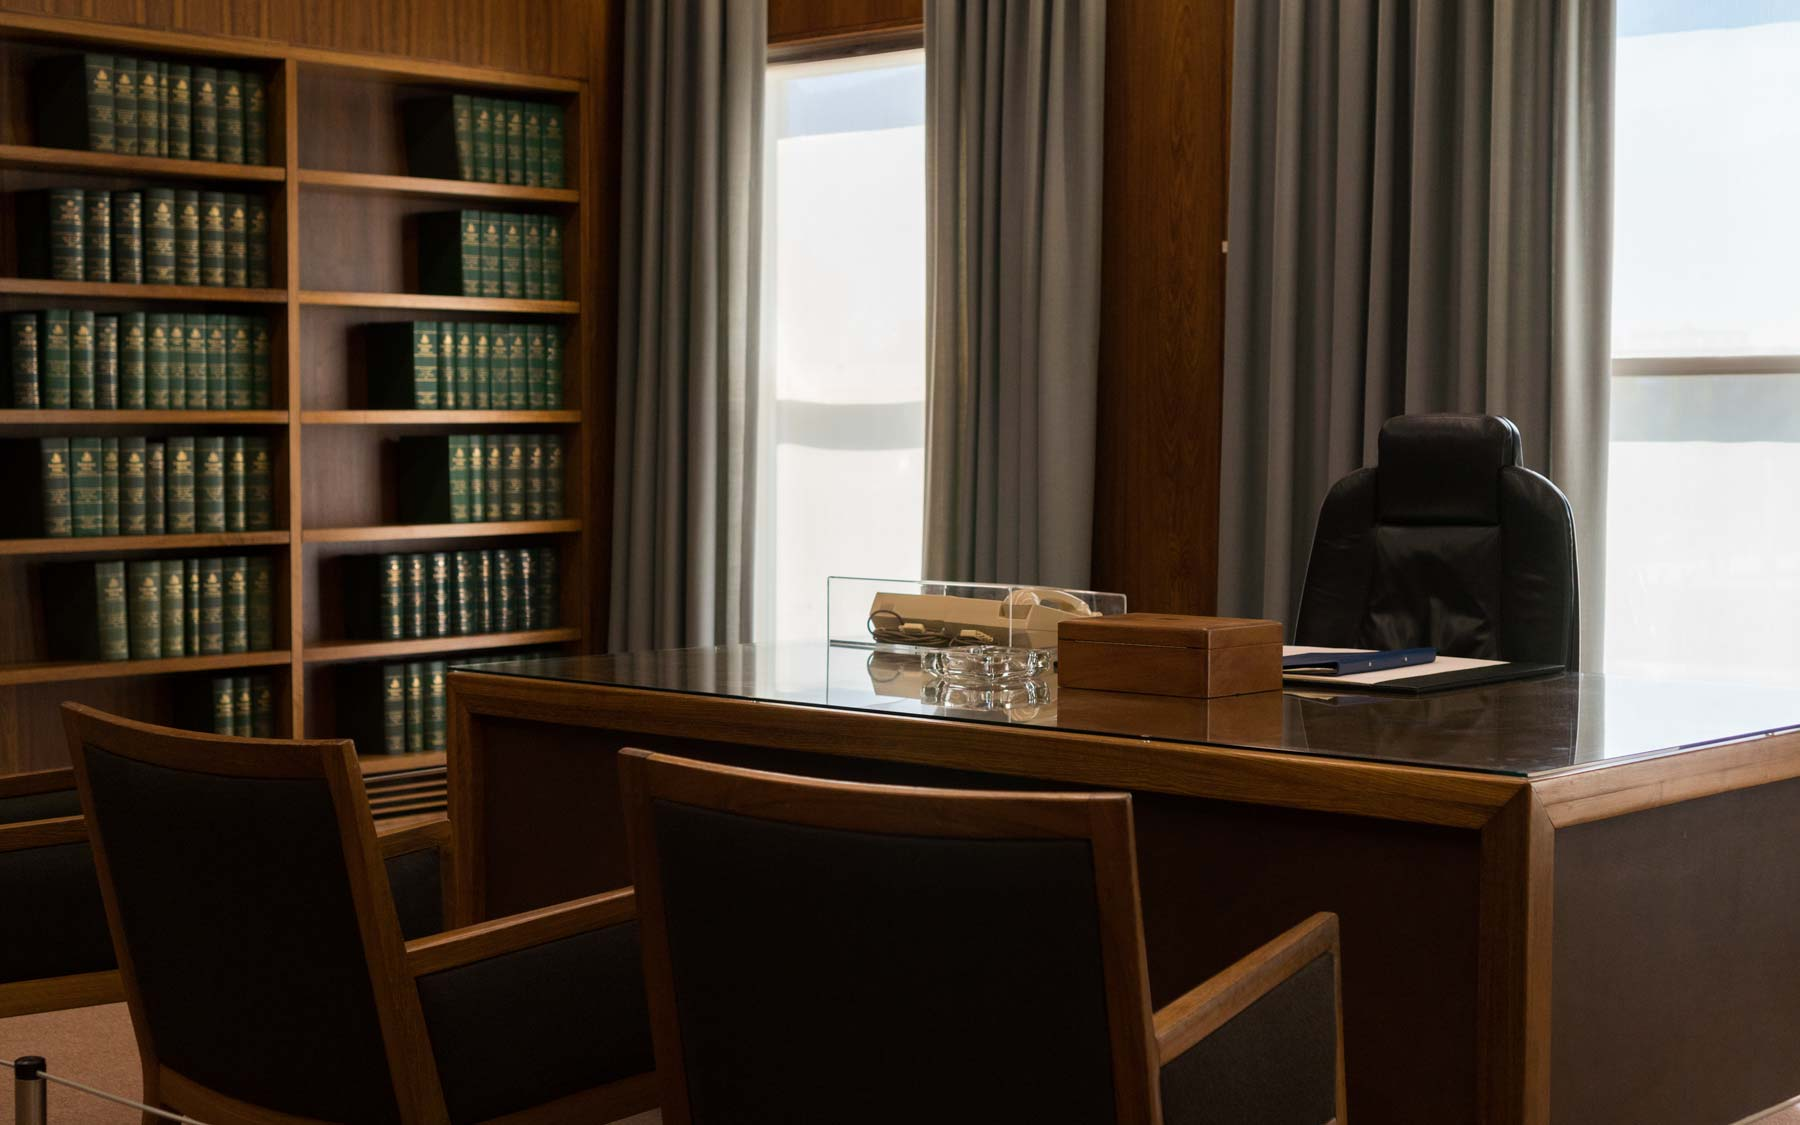 Bob Hawke's office in the original Parliament building.